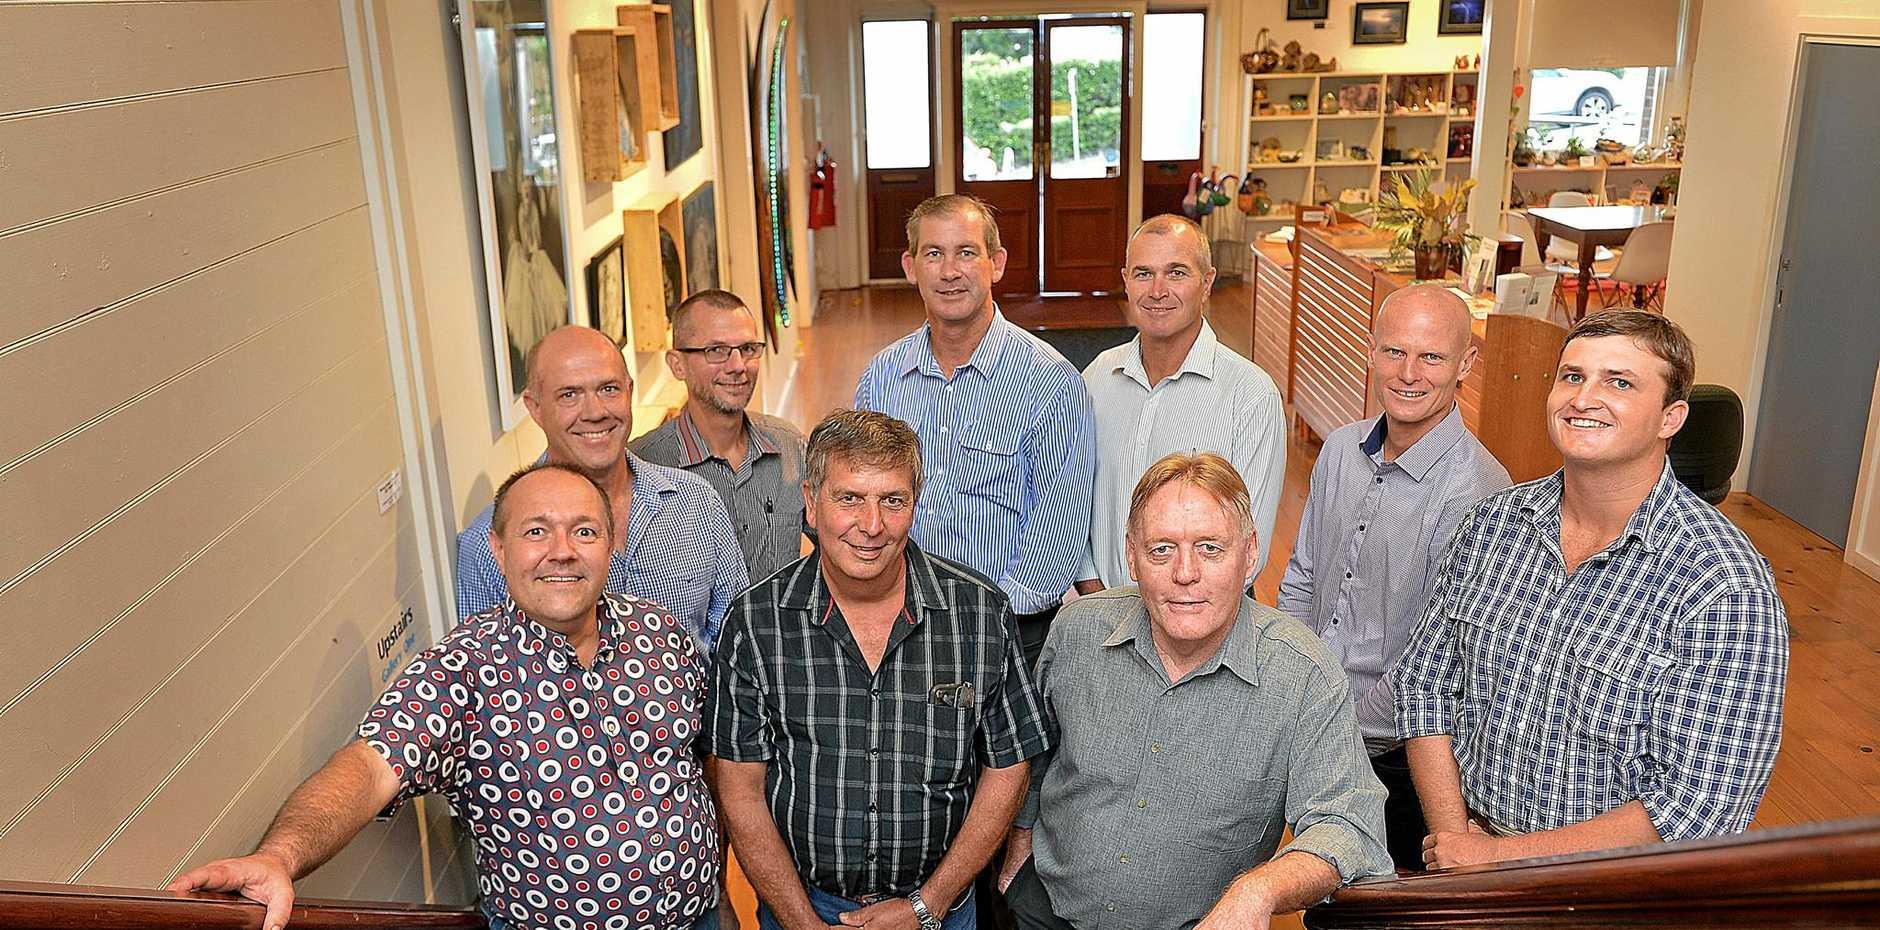 GYMPIE REGIONAL COUNCIL: Daryl Dodt, Mal Gear, Dan Stewart, Mayor Mick Curran, Bob Leitch, Glen Hartwig, James Cochrane, Mark McDonald and Hilary Smerdon.